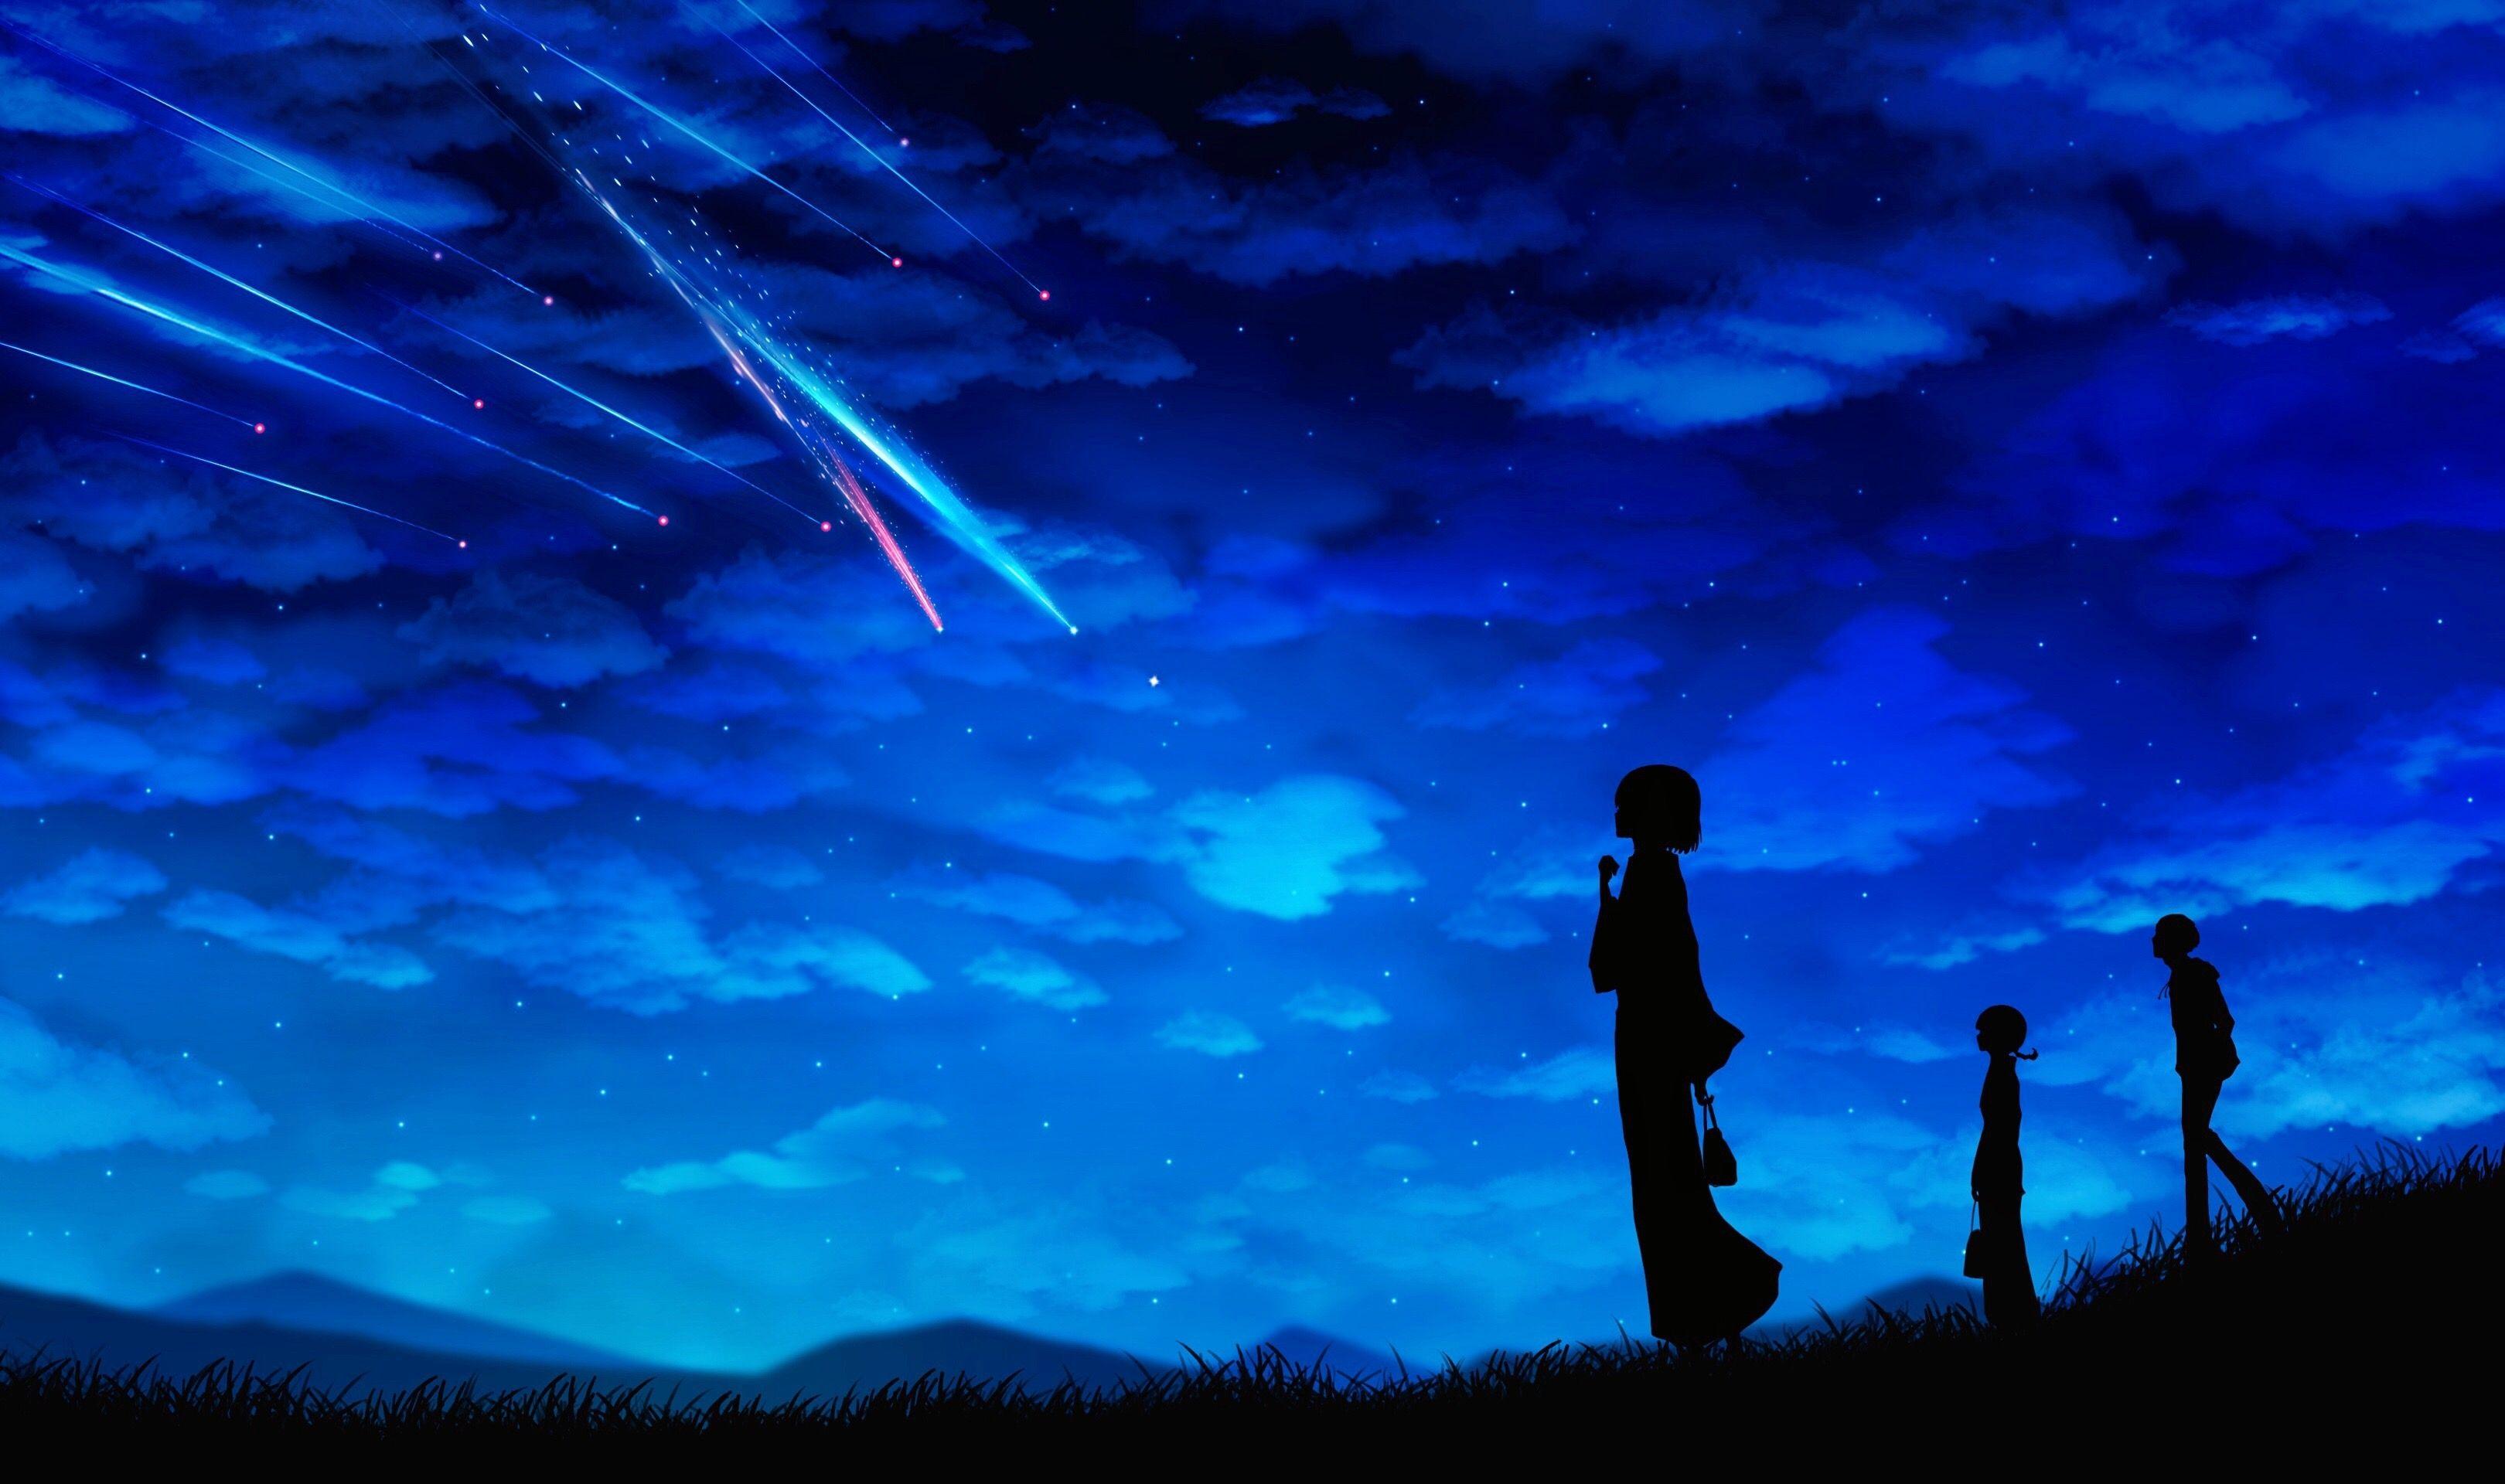 Landscape Night Anime